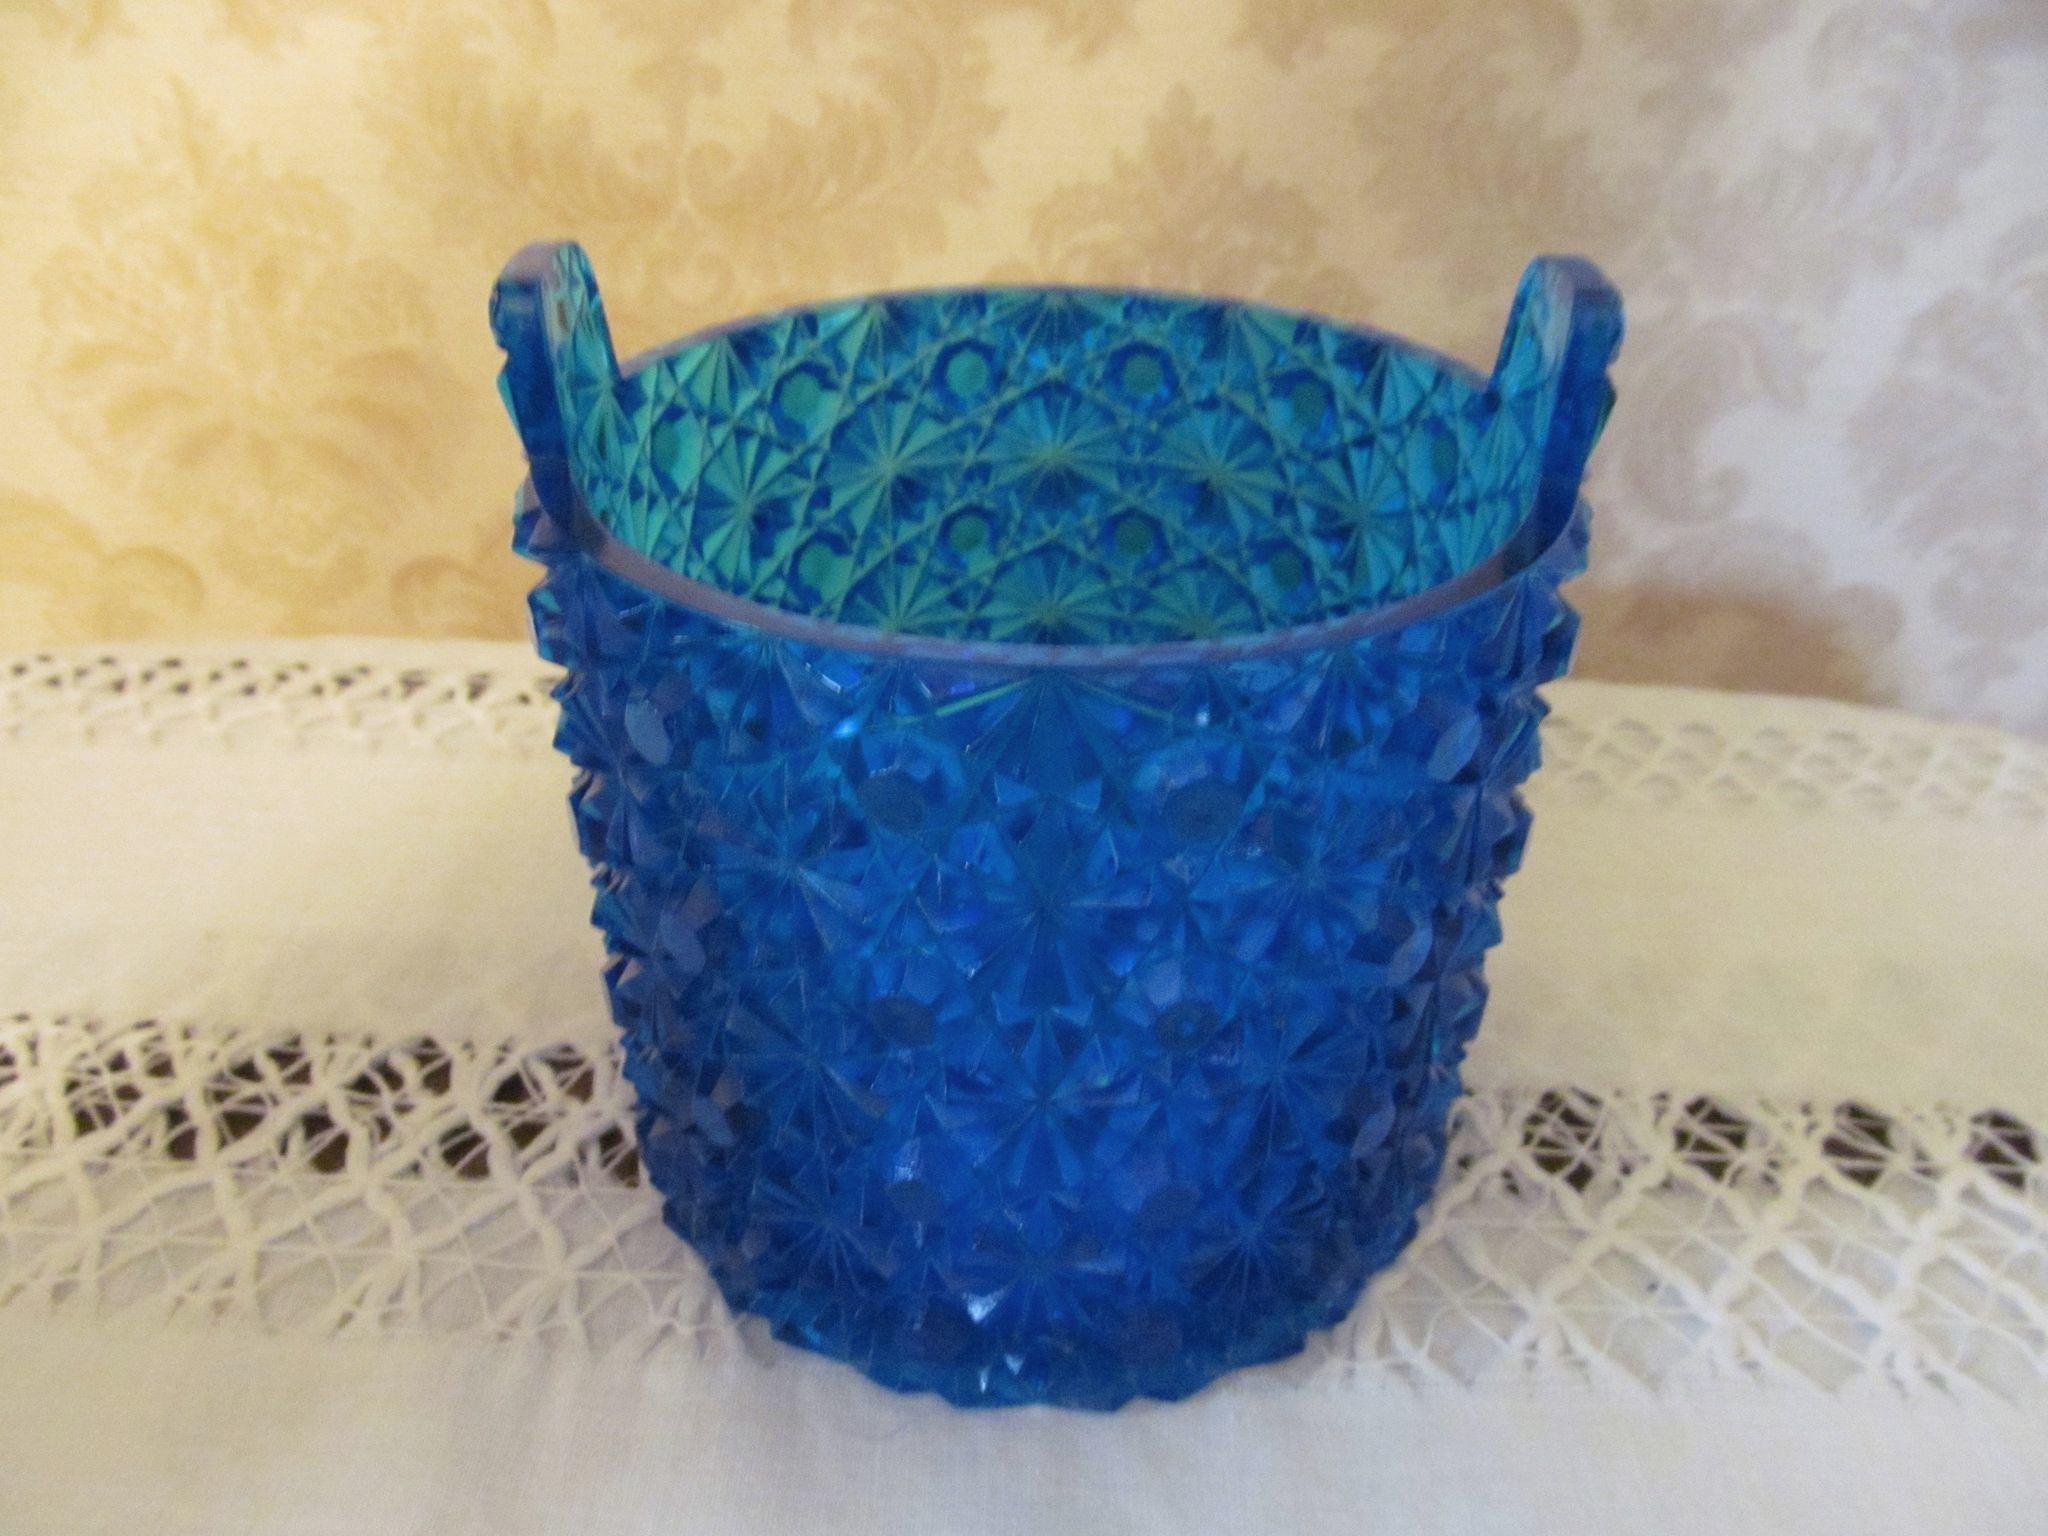 Fenton Blue Daisy & Button Bucket Jar, Dish